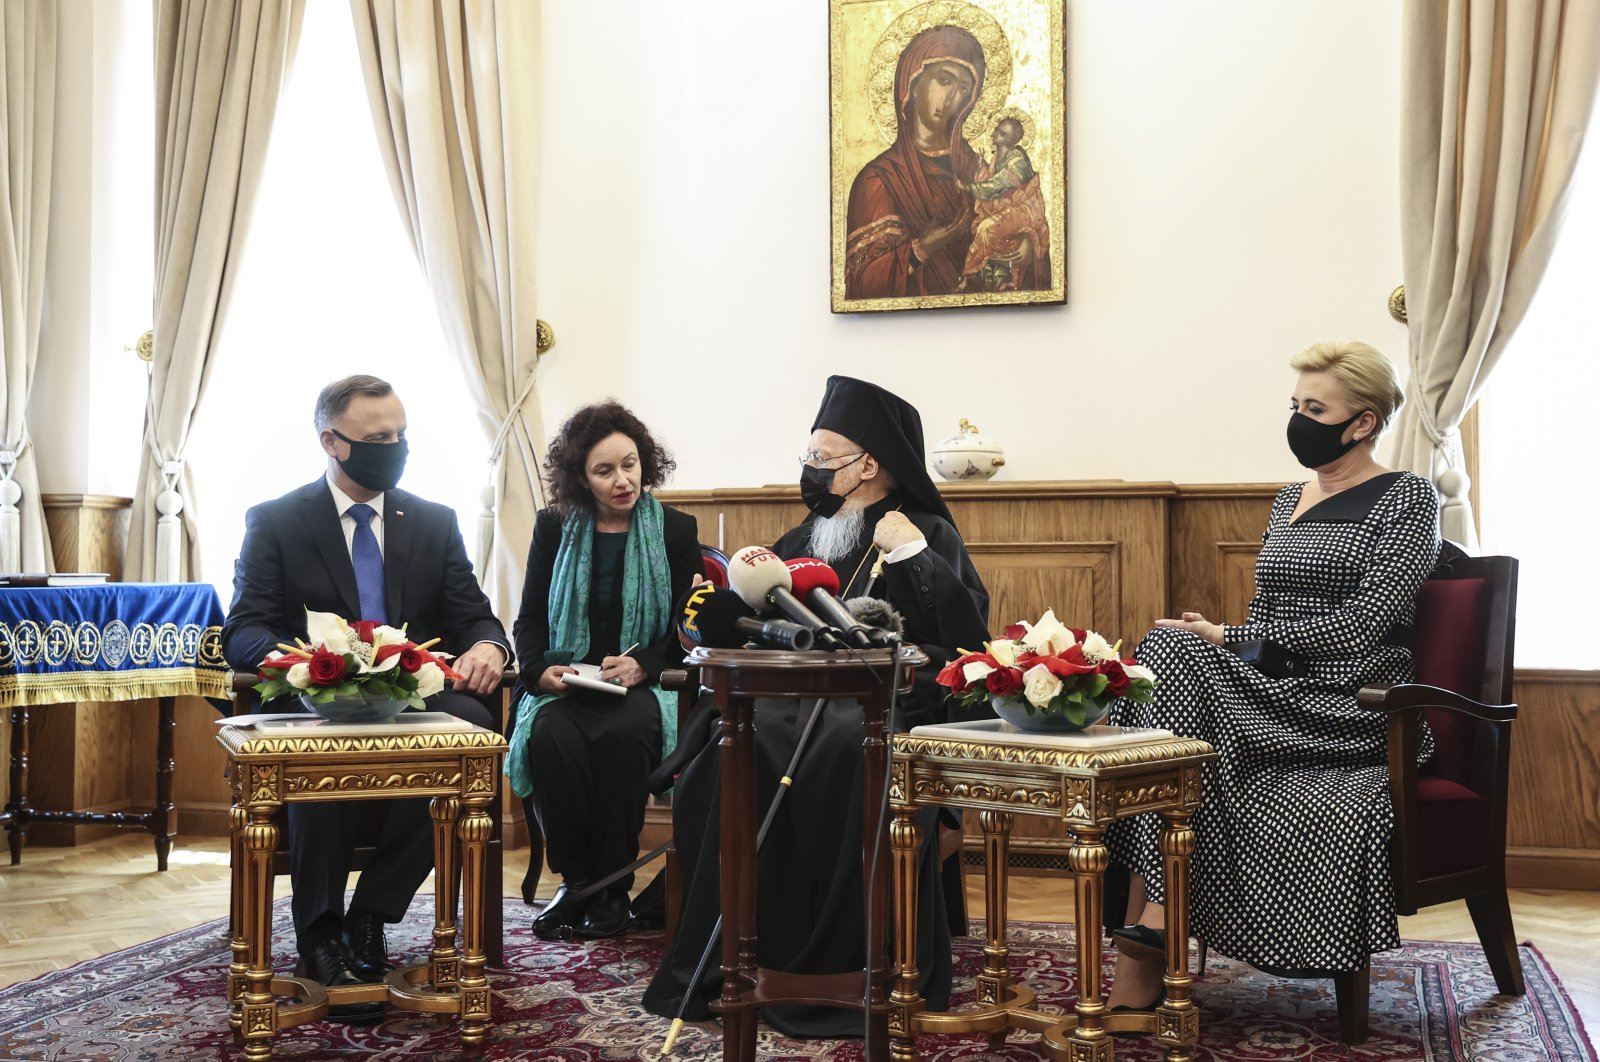 Poland's PresidentAndrzej Duda (L) and his wife Agata Kornhauser Duda (R) meet with Fener Greek Orthodox Patriarch Bartholomew (R-2) in Istanbul, Turkey, May 25, 2021. (AA Photo)